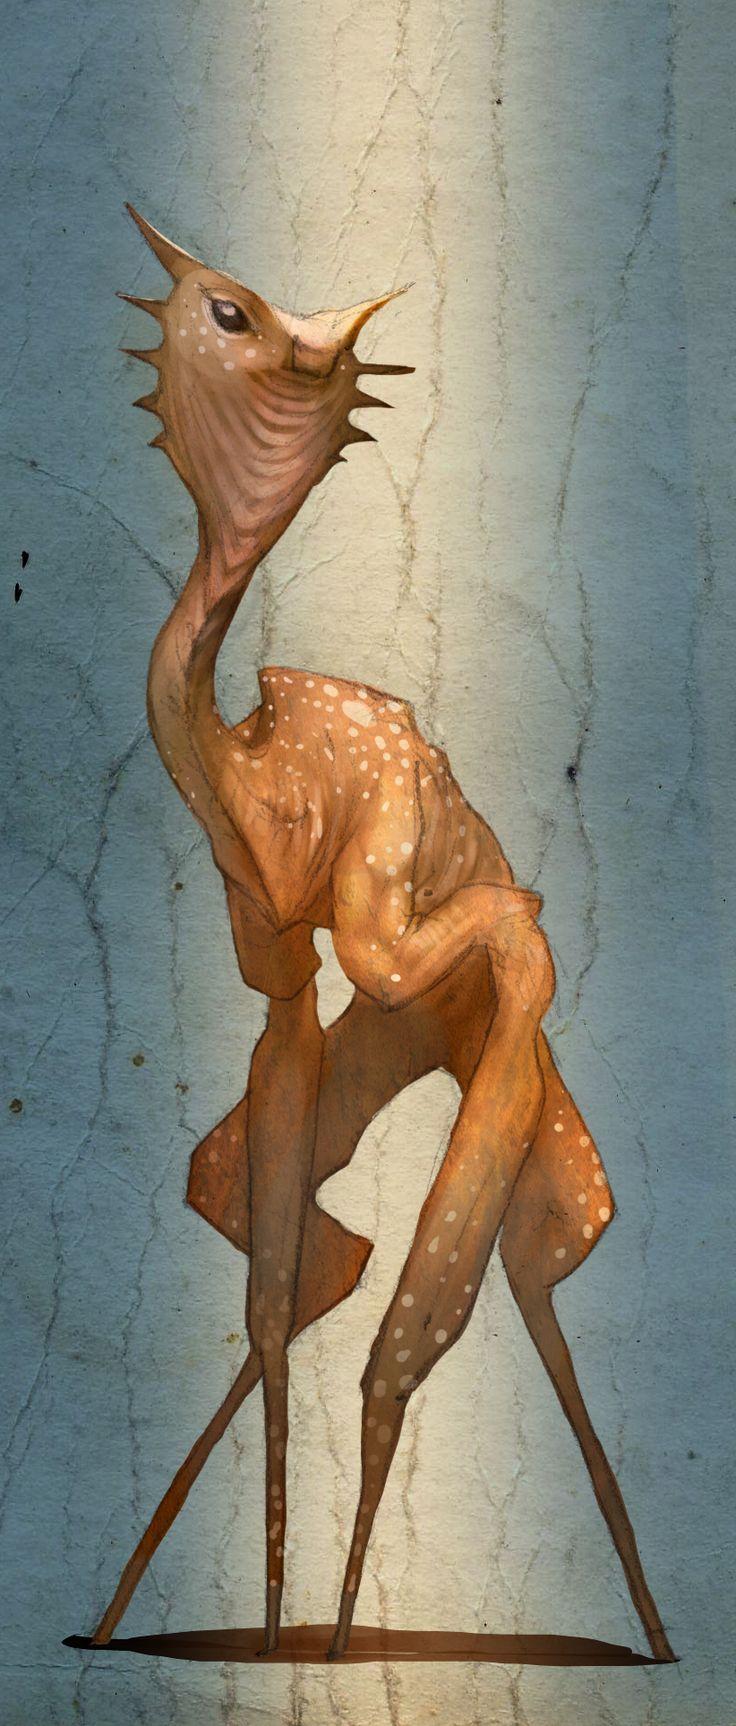 Alien Deer by extracard.deviantart.com on @deviantART